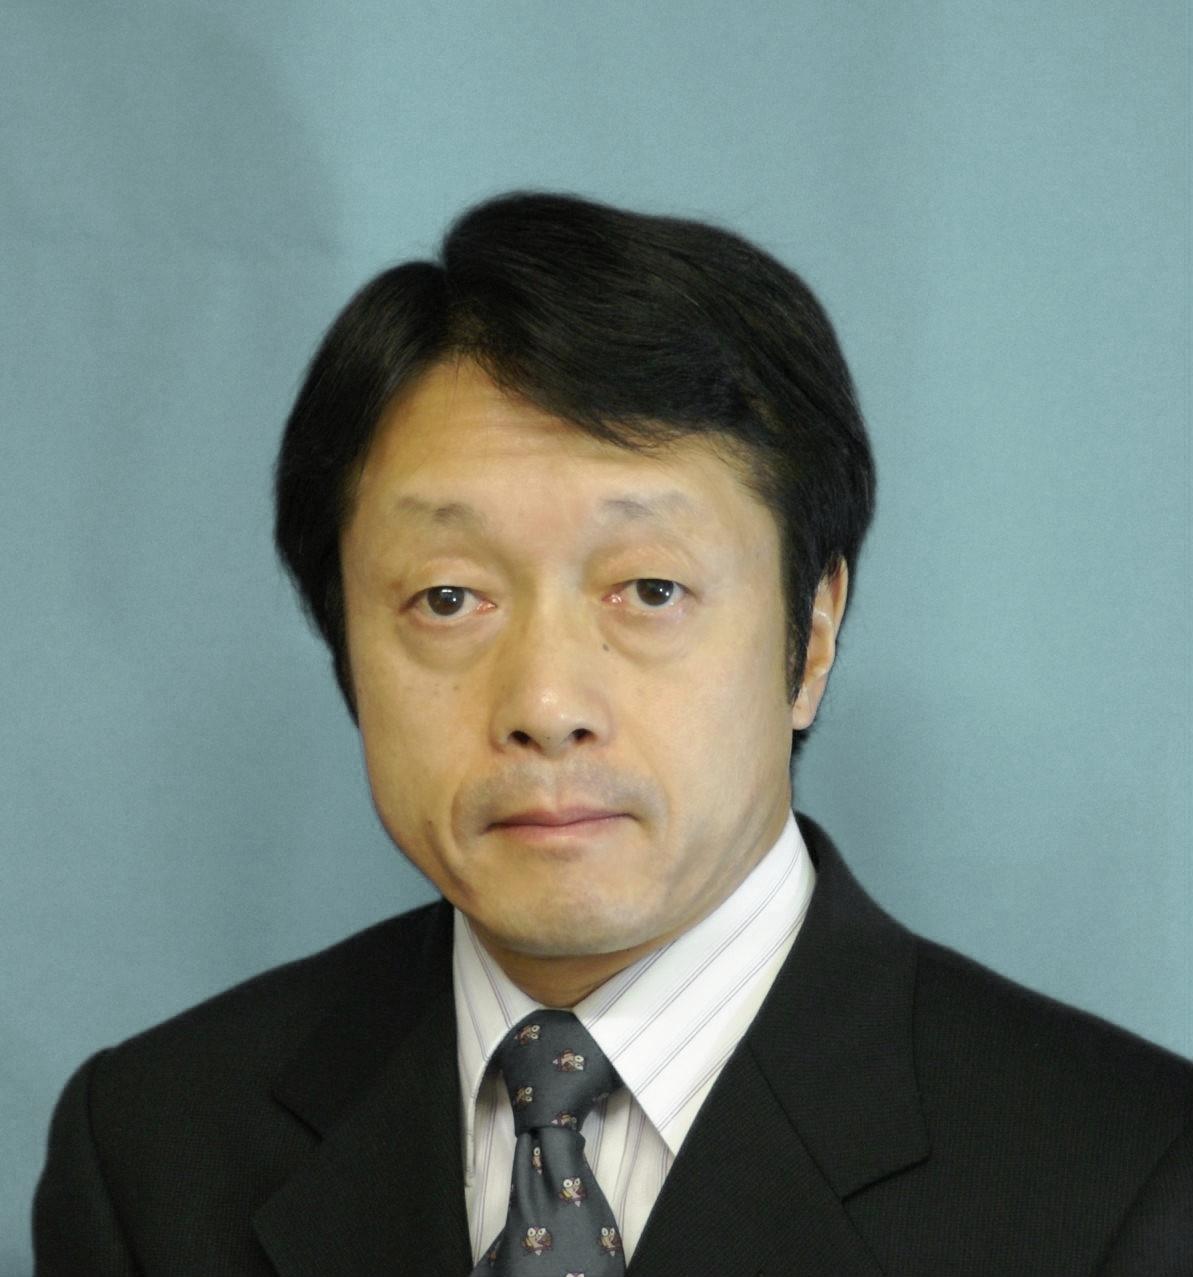 Jun Uozuml